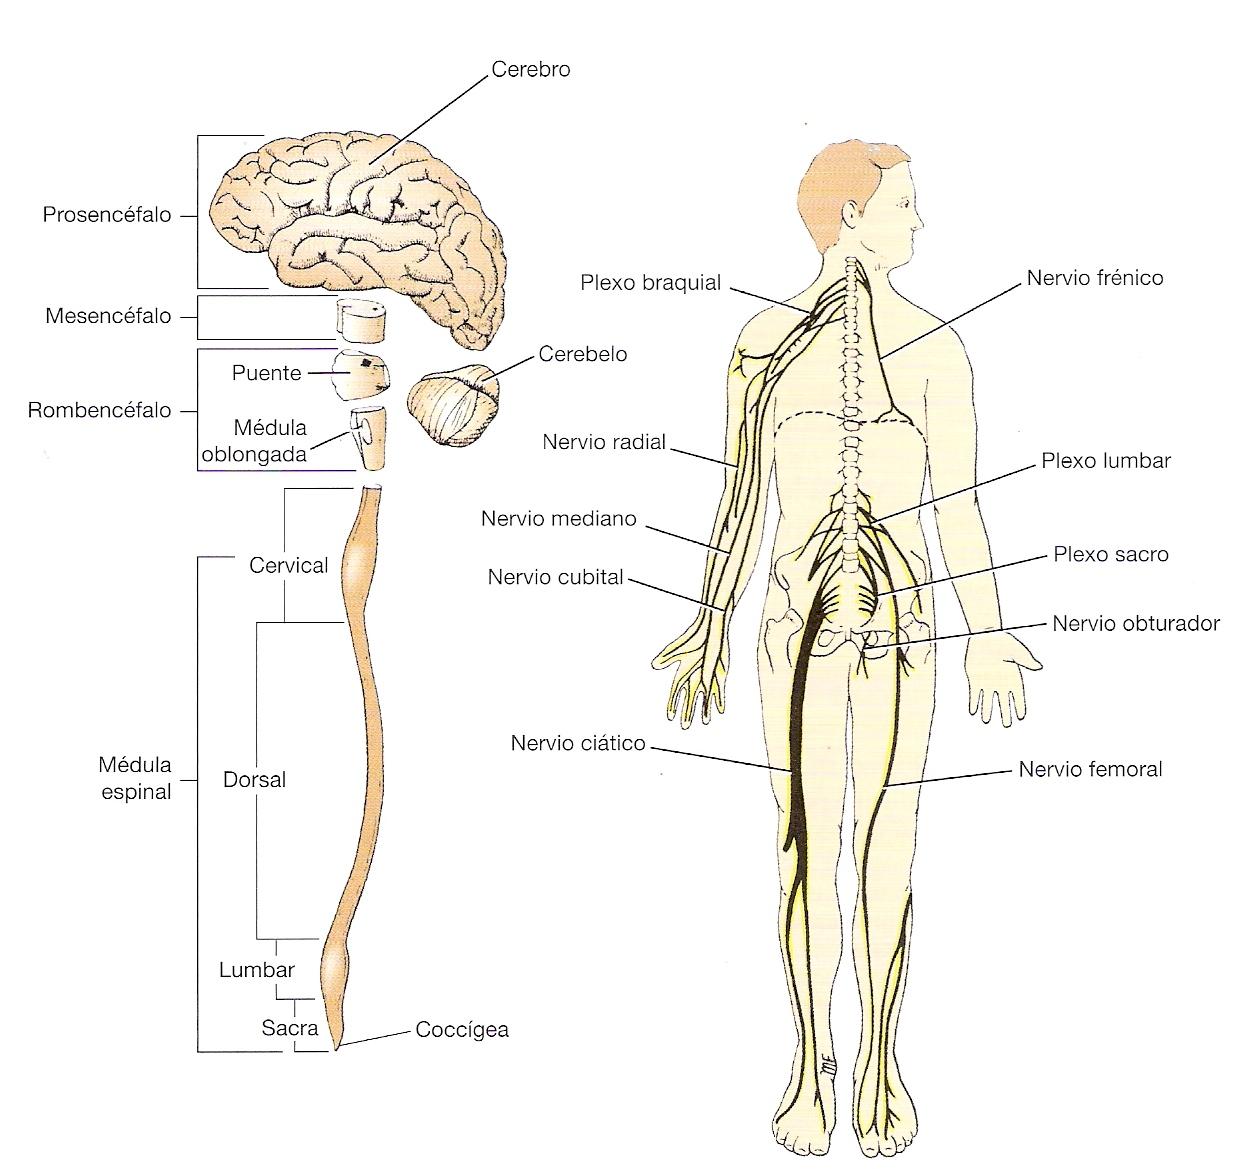 sistema nervioso: el sistema nervioso